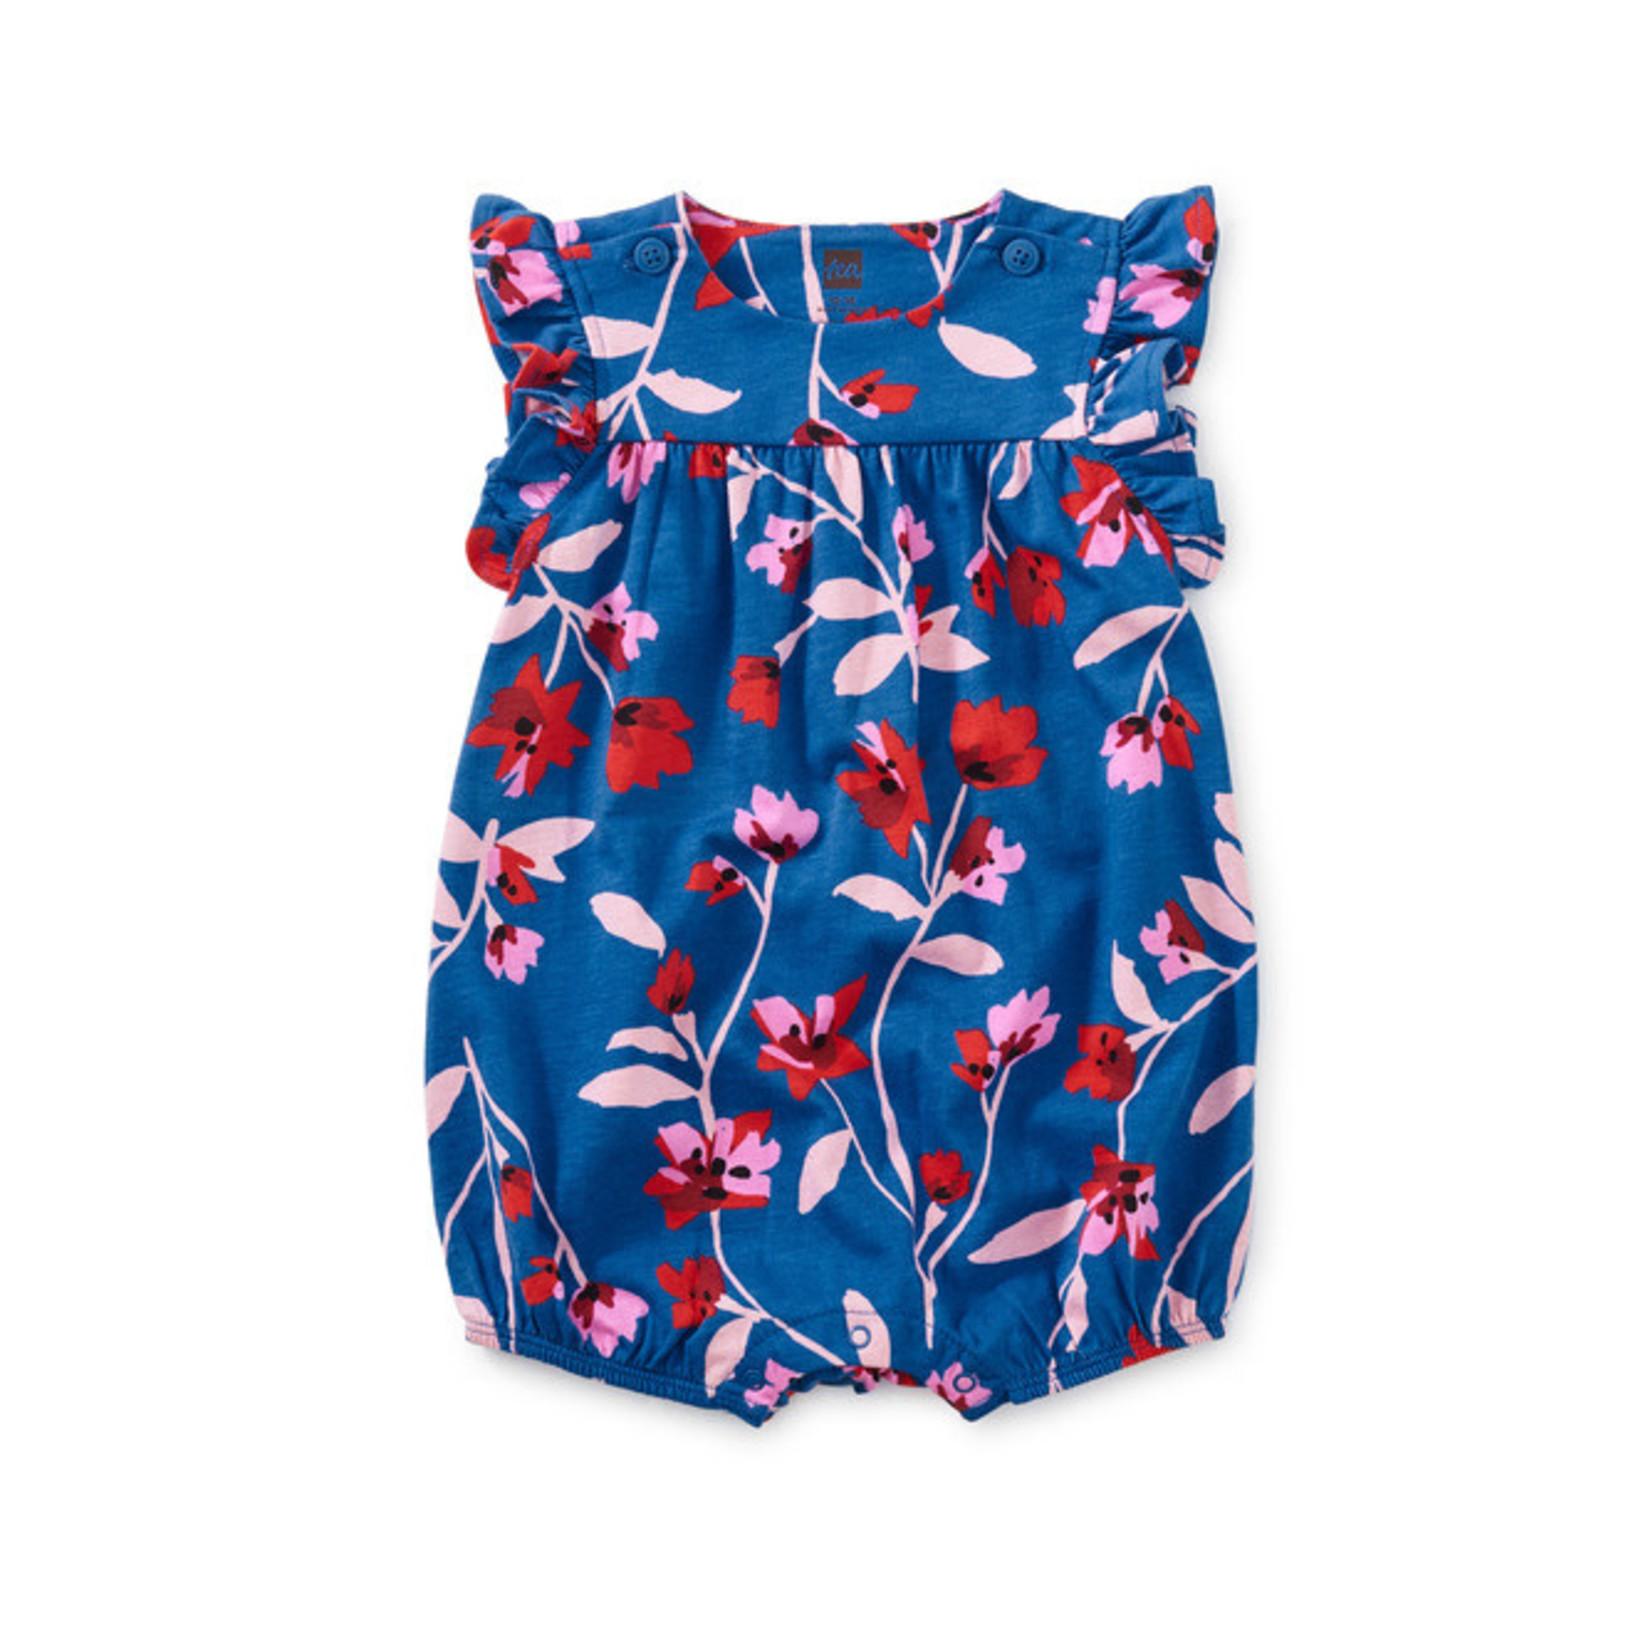 Tea Collection Flutter Button Baby Romper - Floral Breeze